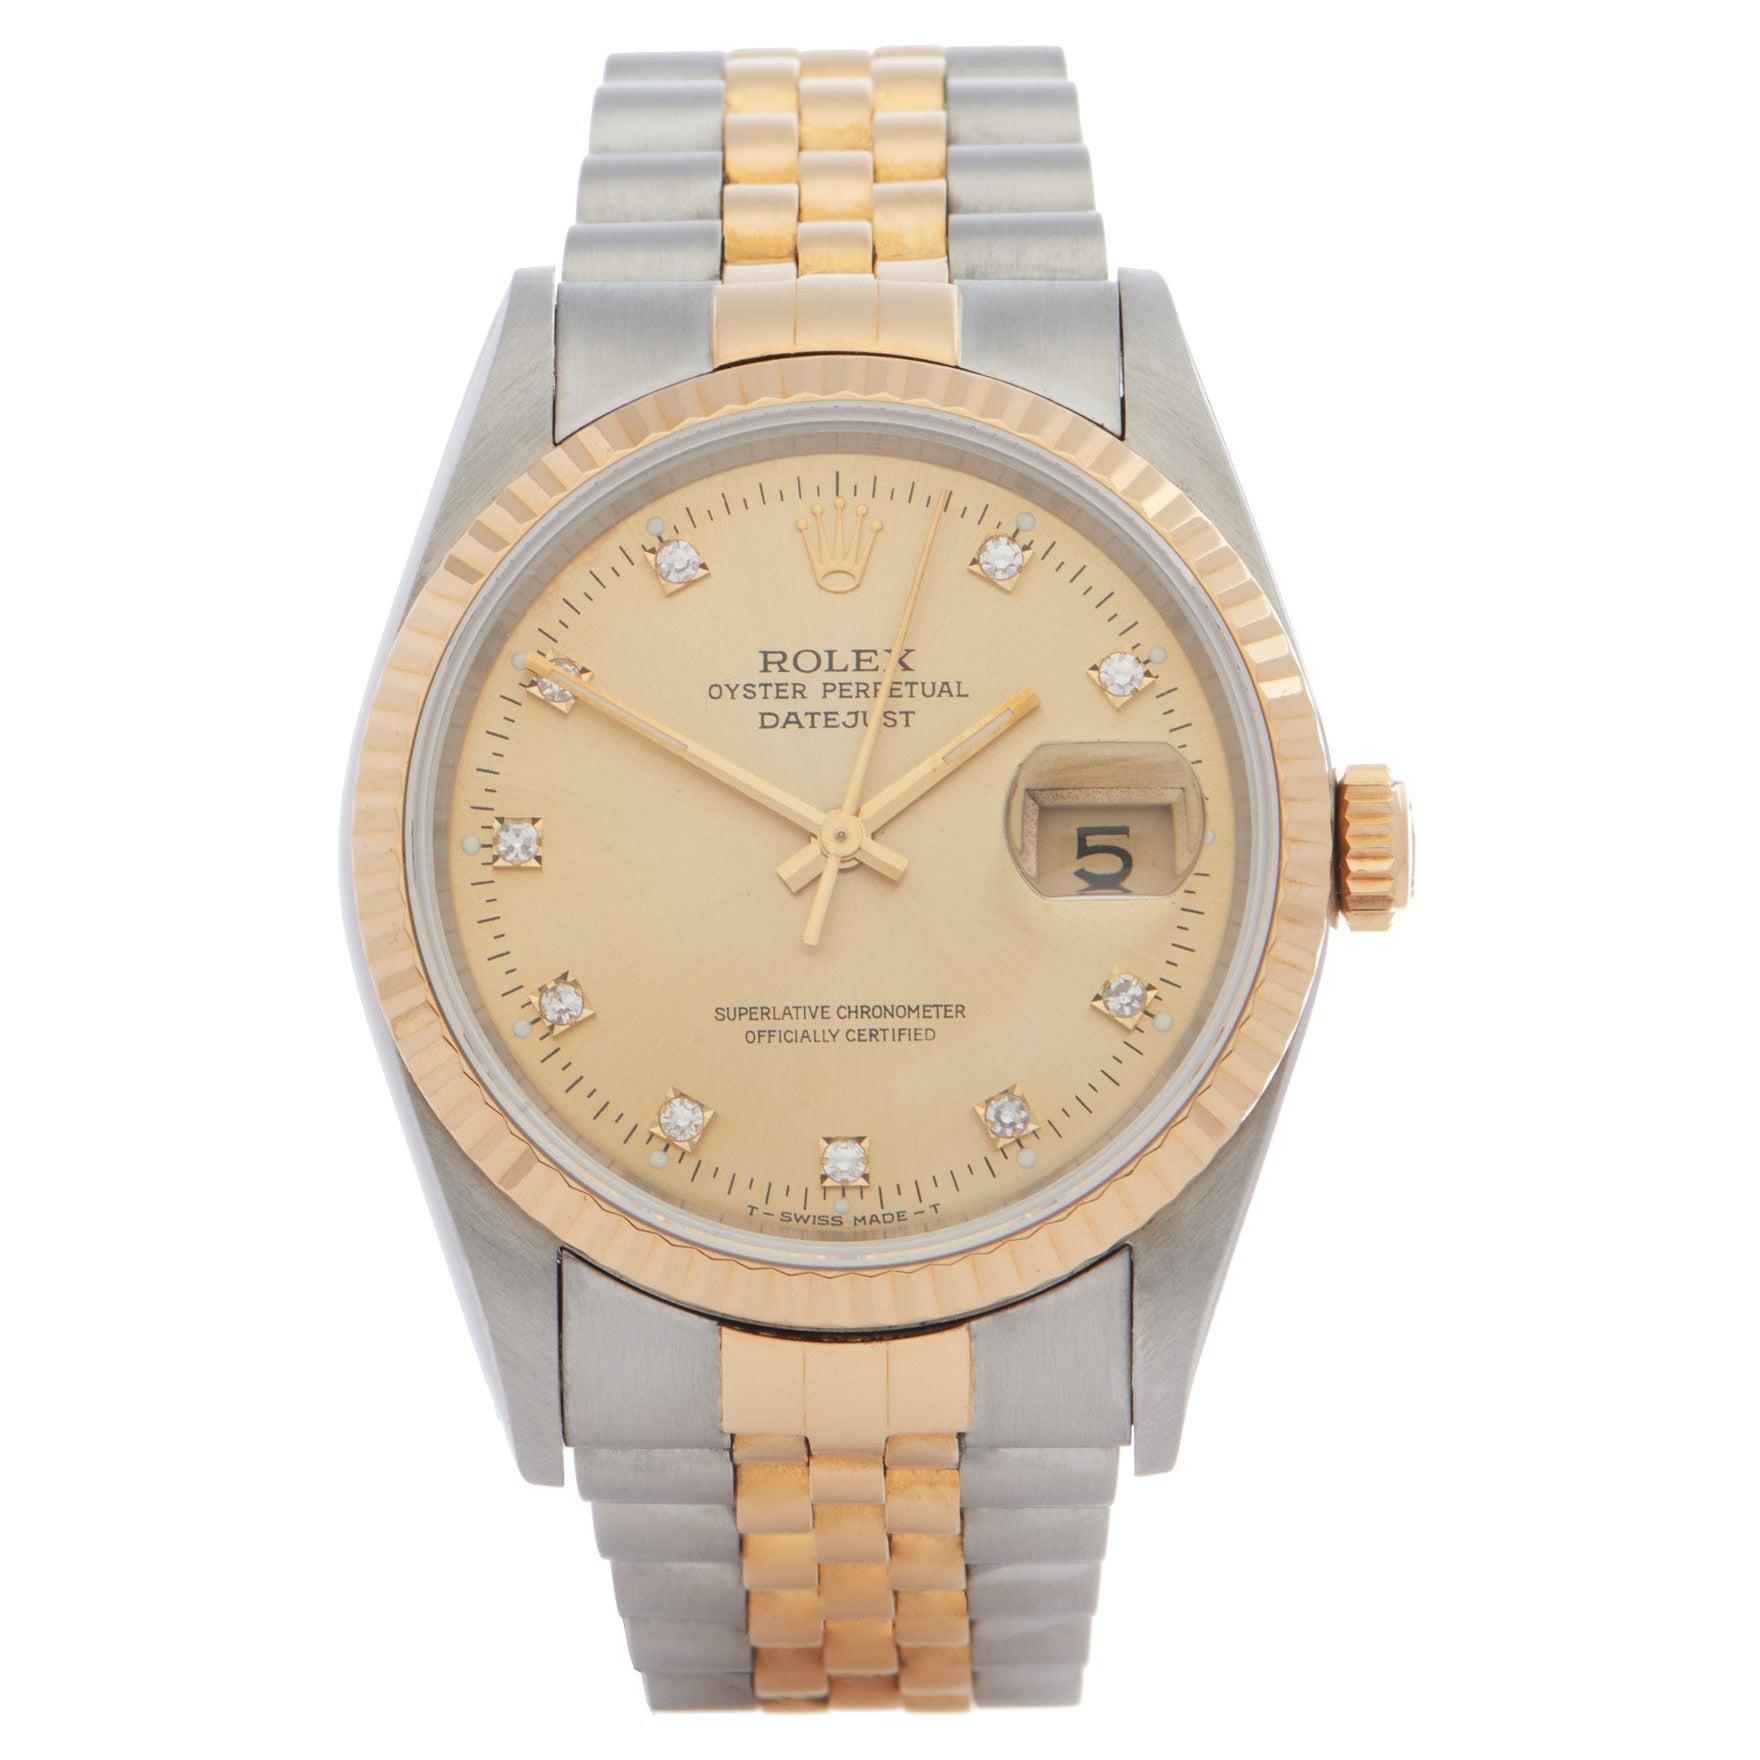 Rolex Datejust 36 16233G Unisex Yellow Gold & Stainless Steel 0 Watch